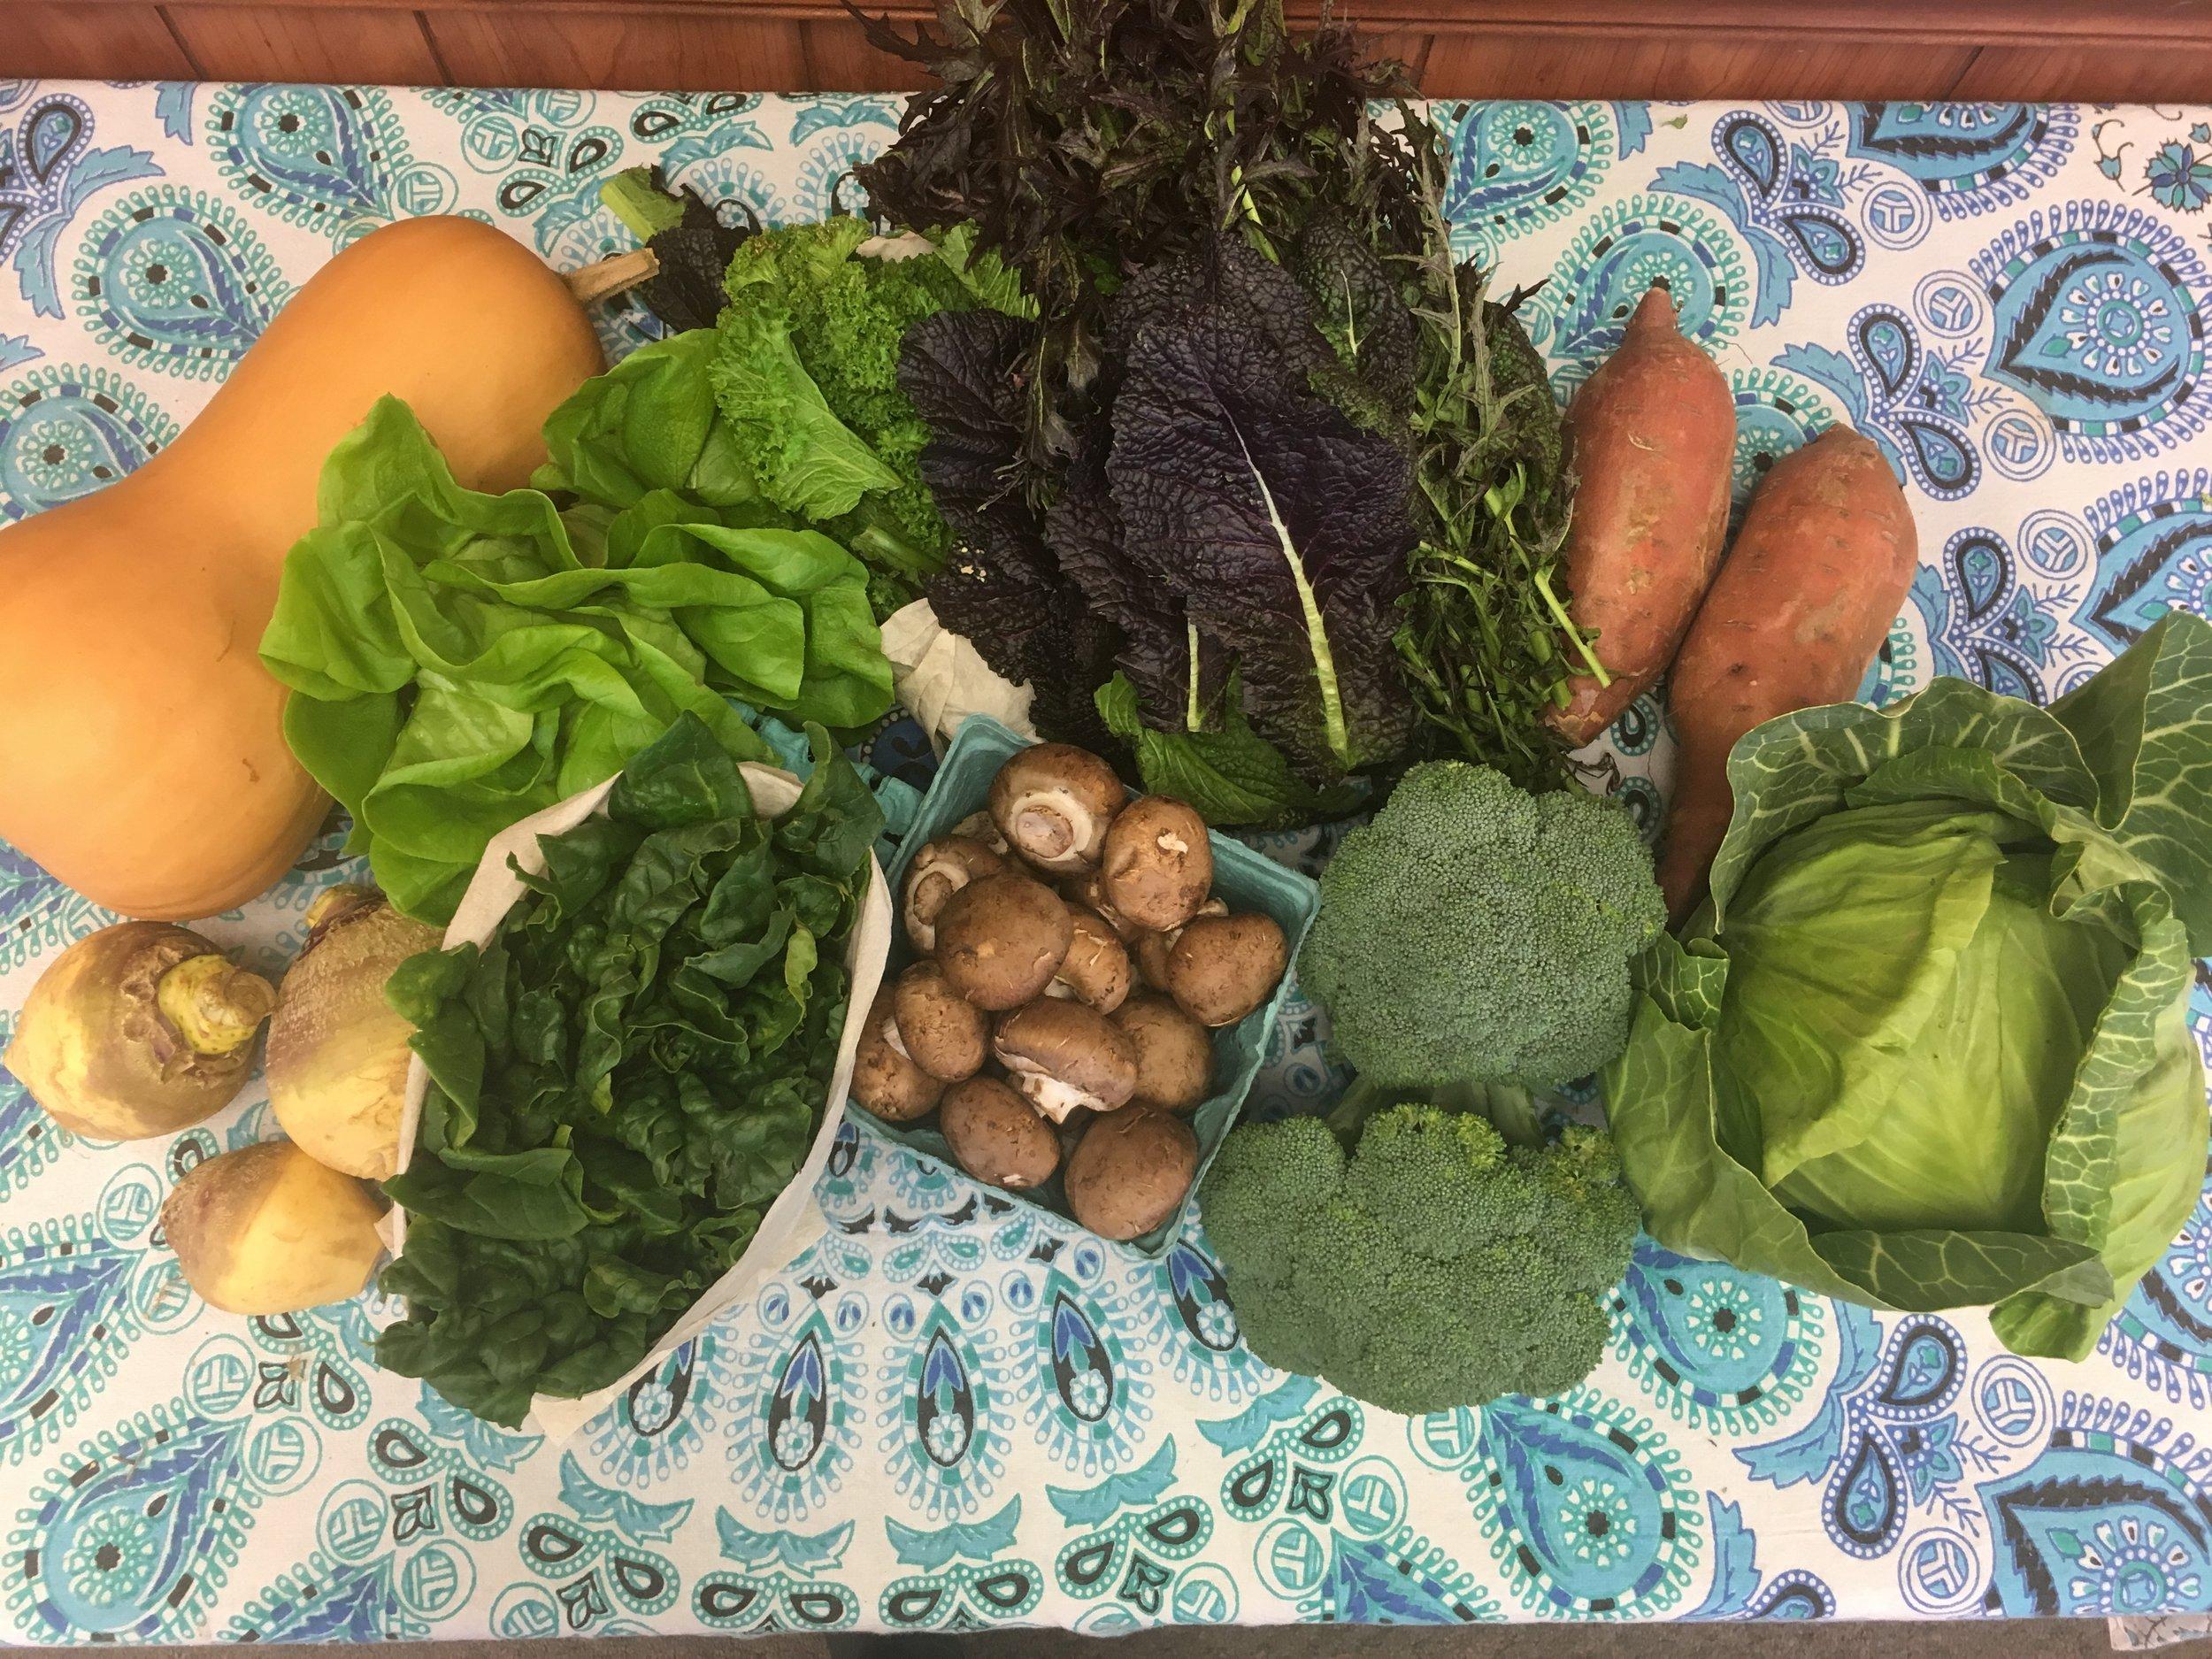 Southern Comfort family- butternut squash, Bibb lettuce, mixed mustard greens, garnet sweet potatoes, rutabaga, spinach, cremini mushrooms, broccoli, and green cabbage.